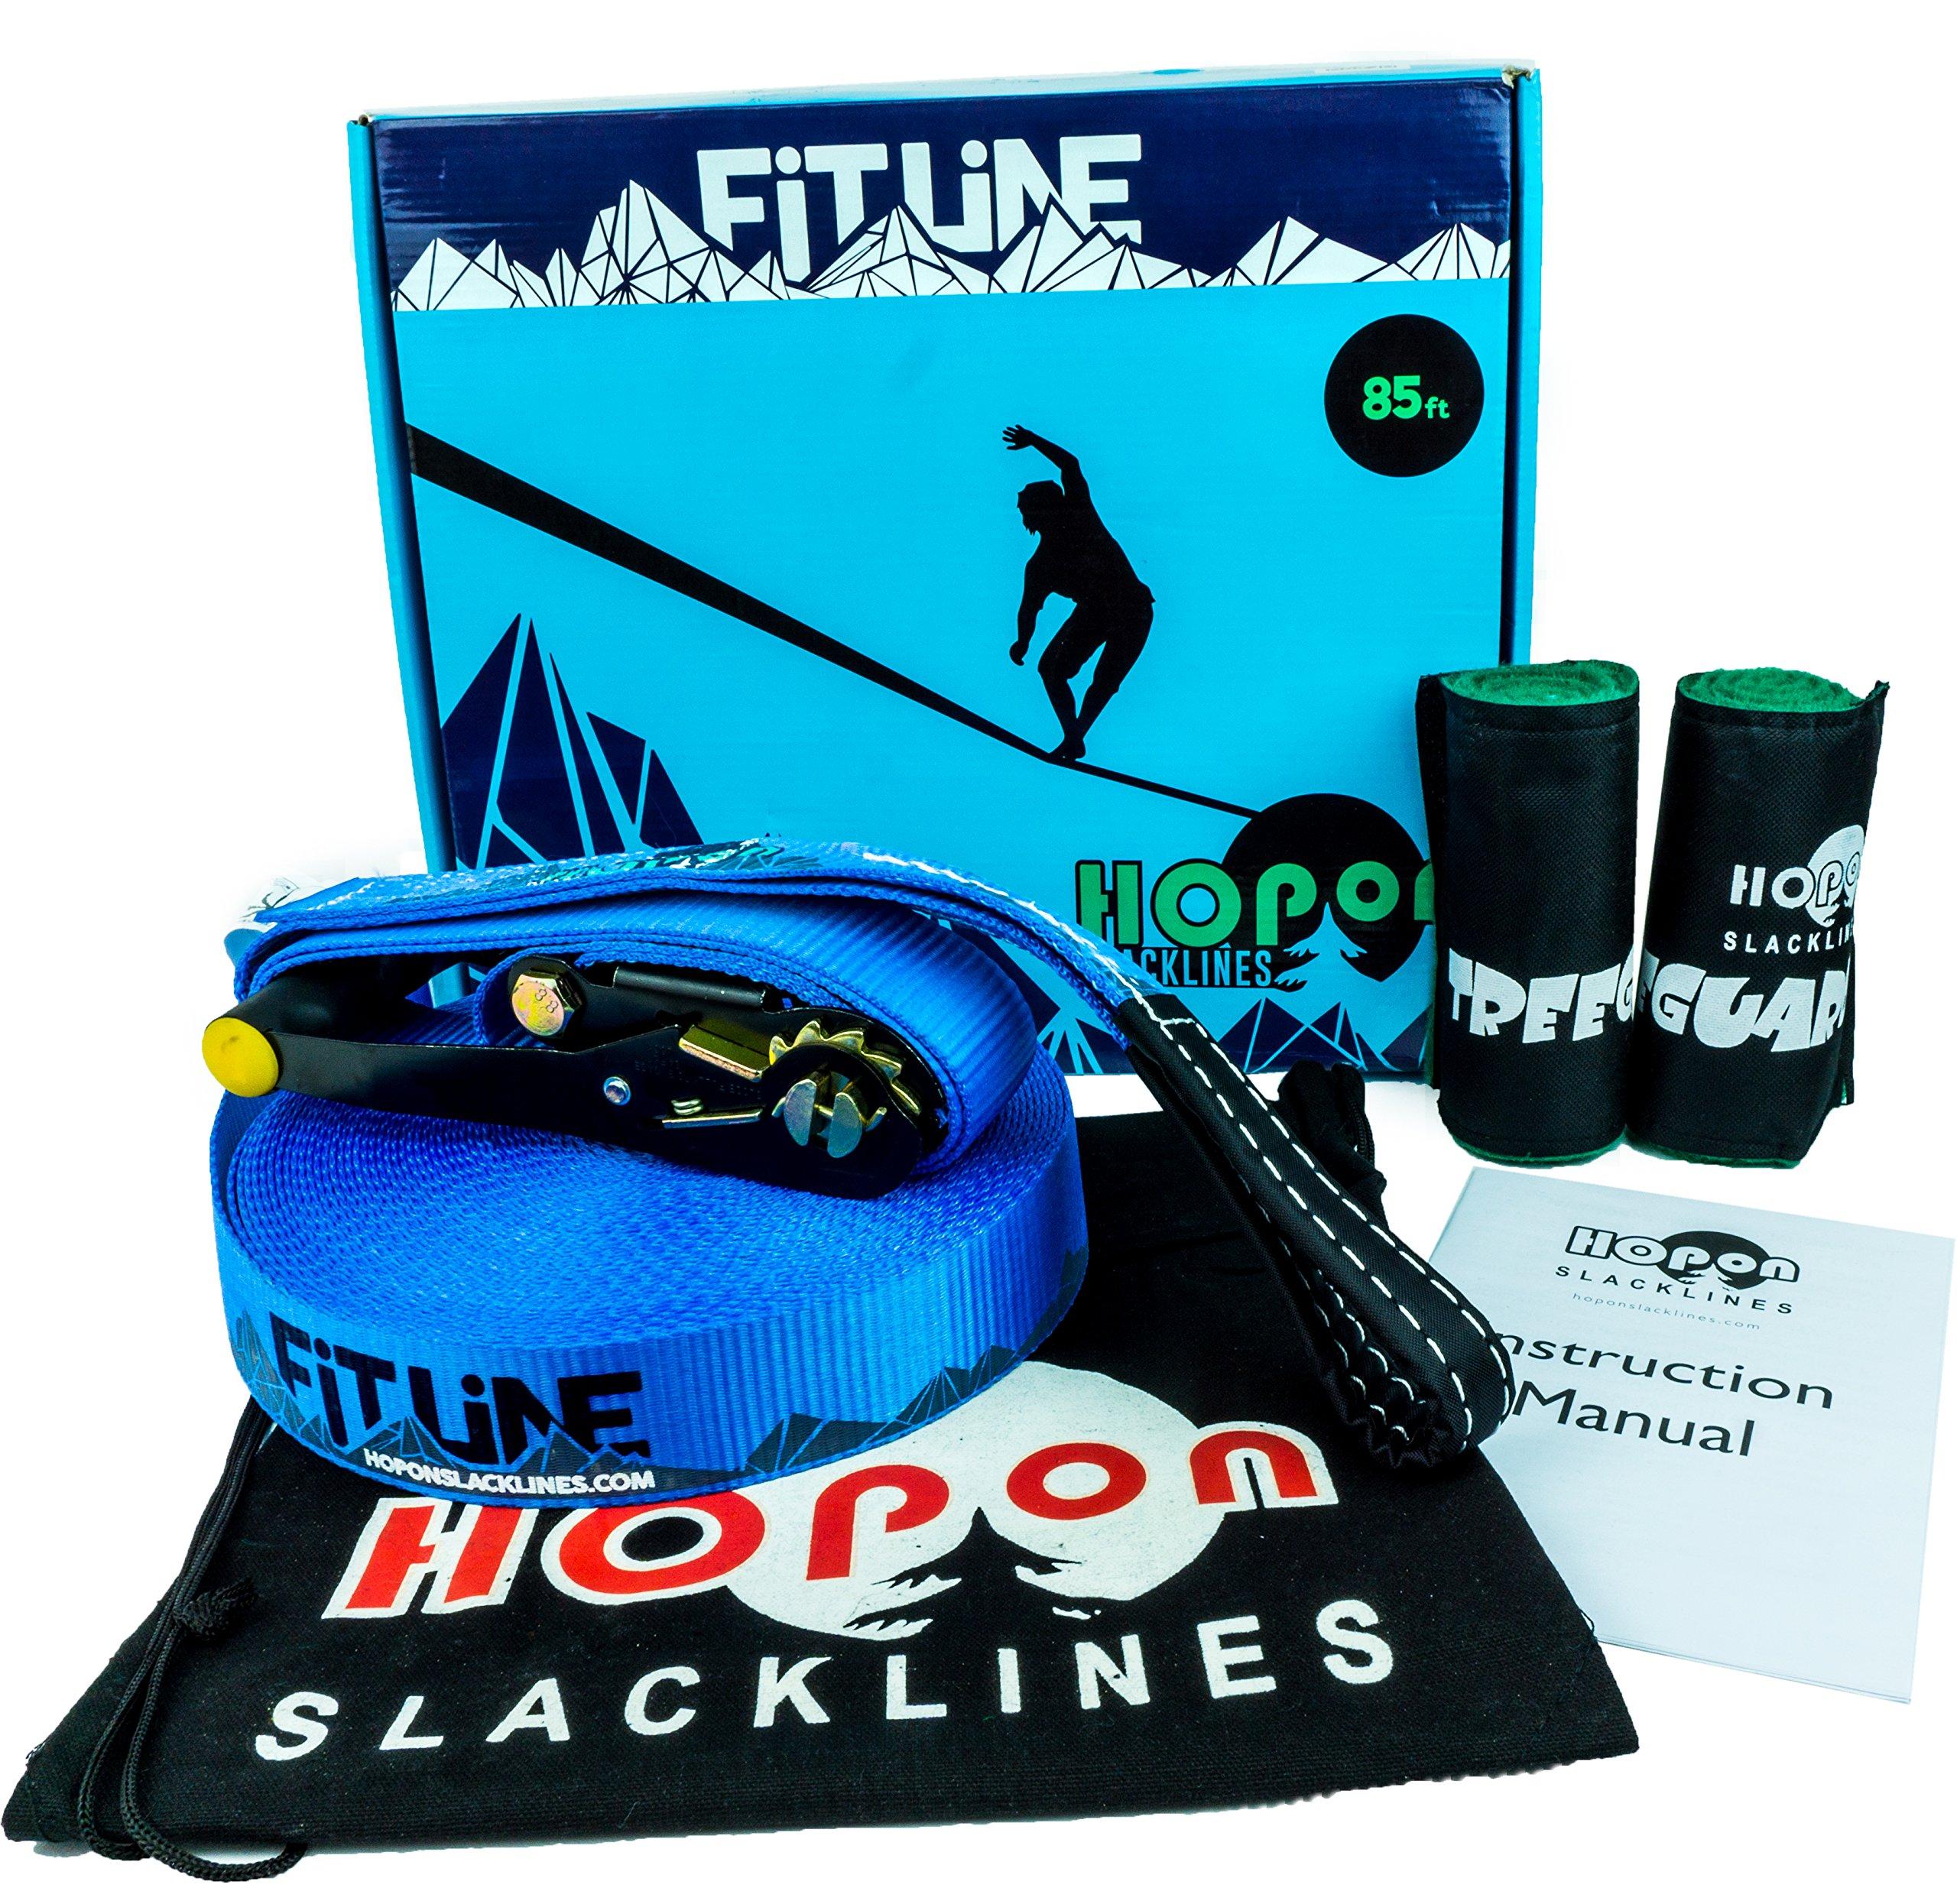 HopOn Slacklines 85ft Fitline Slackline Kit For Beginners with Ratchet and Tree Protection - Blue by HopOn Slacklines